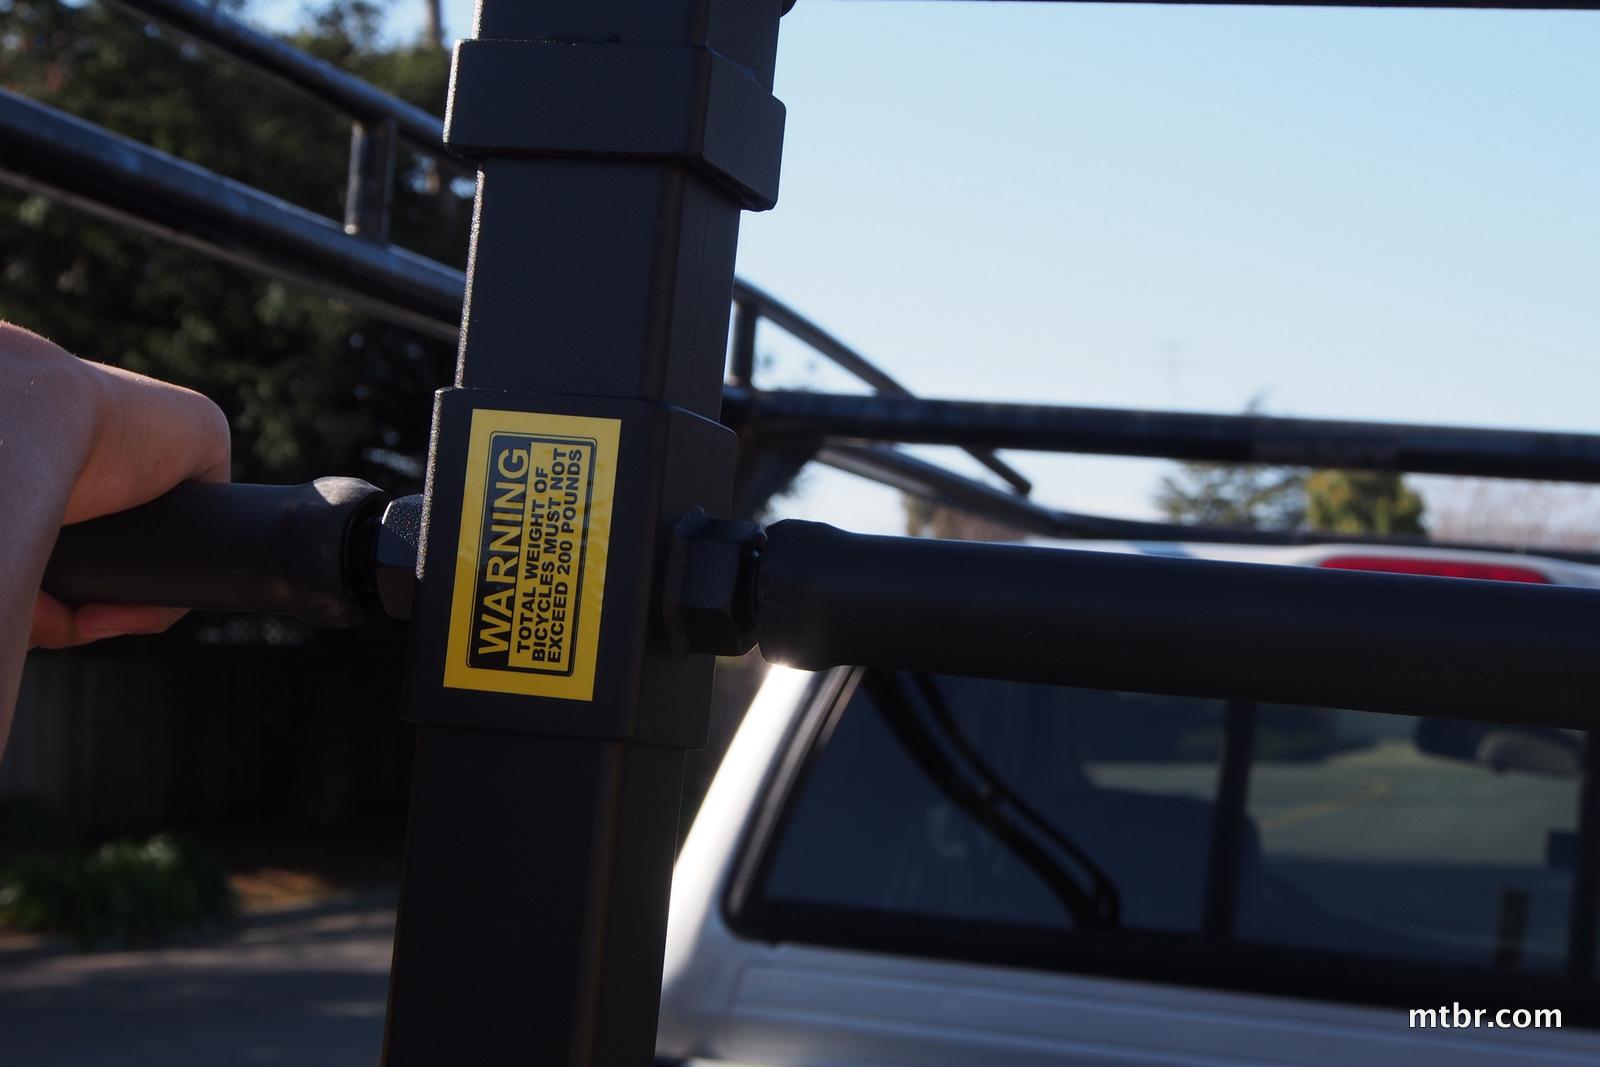 Upright Designs Totem Pole Bike Rack Mtbr Com